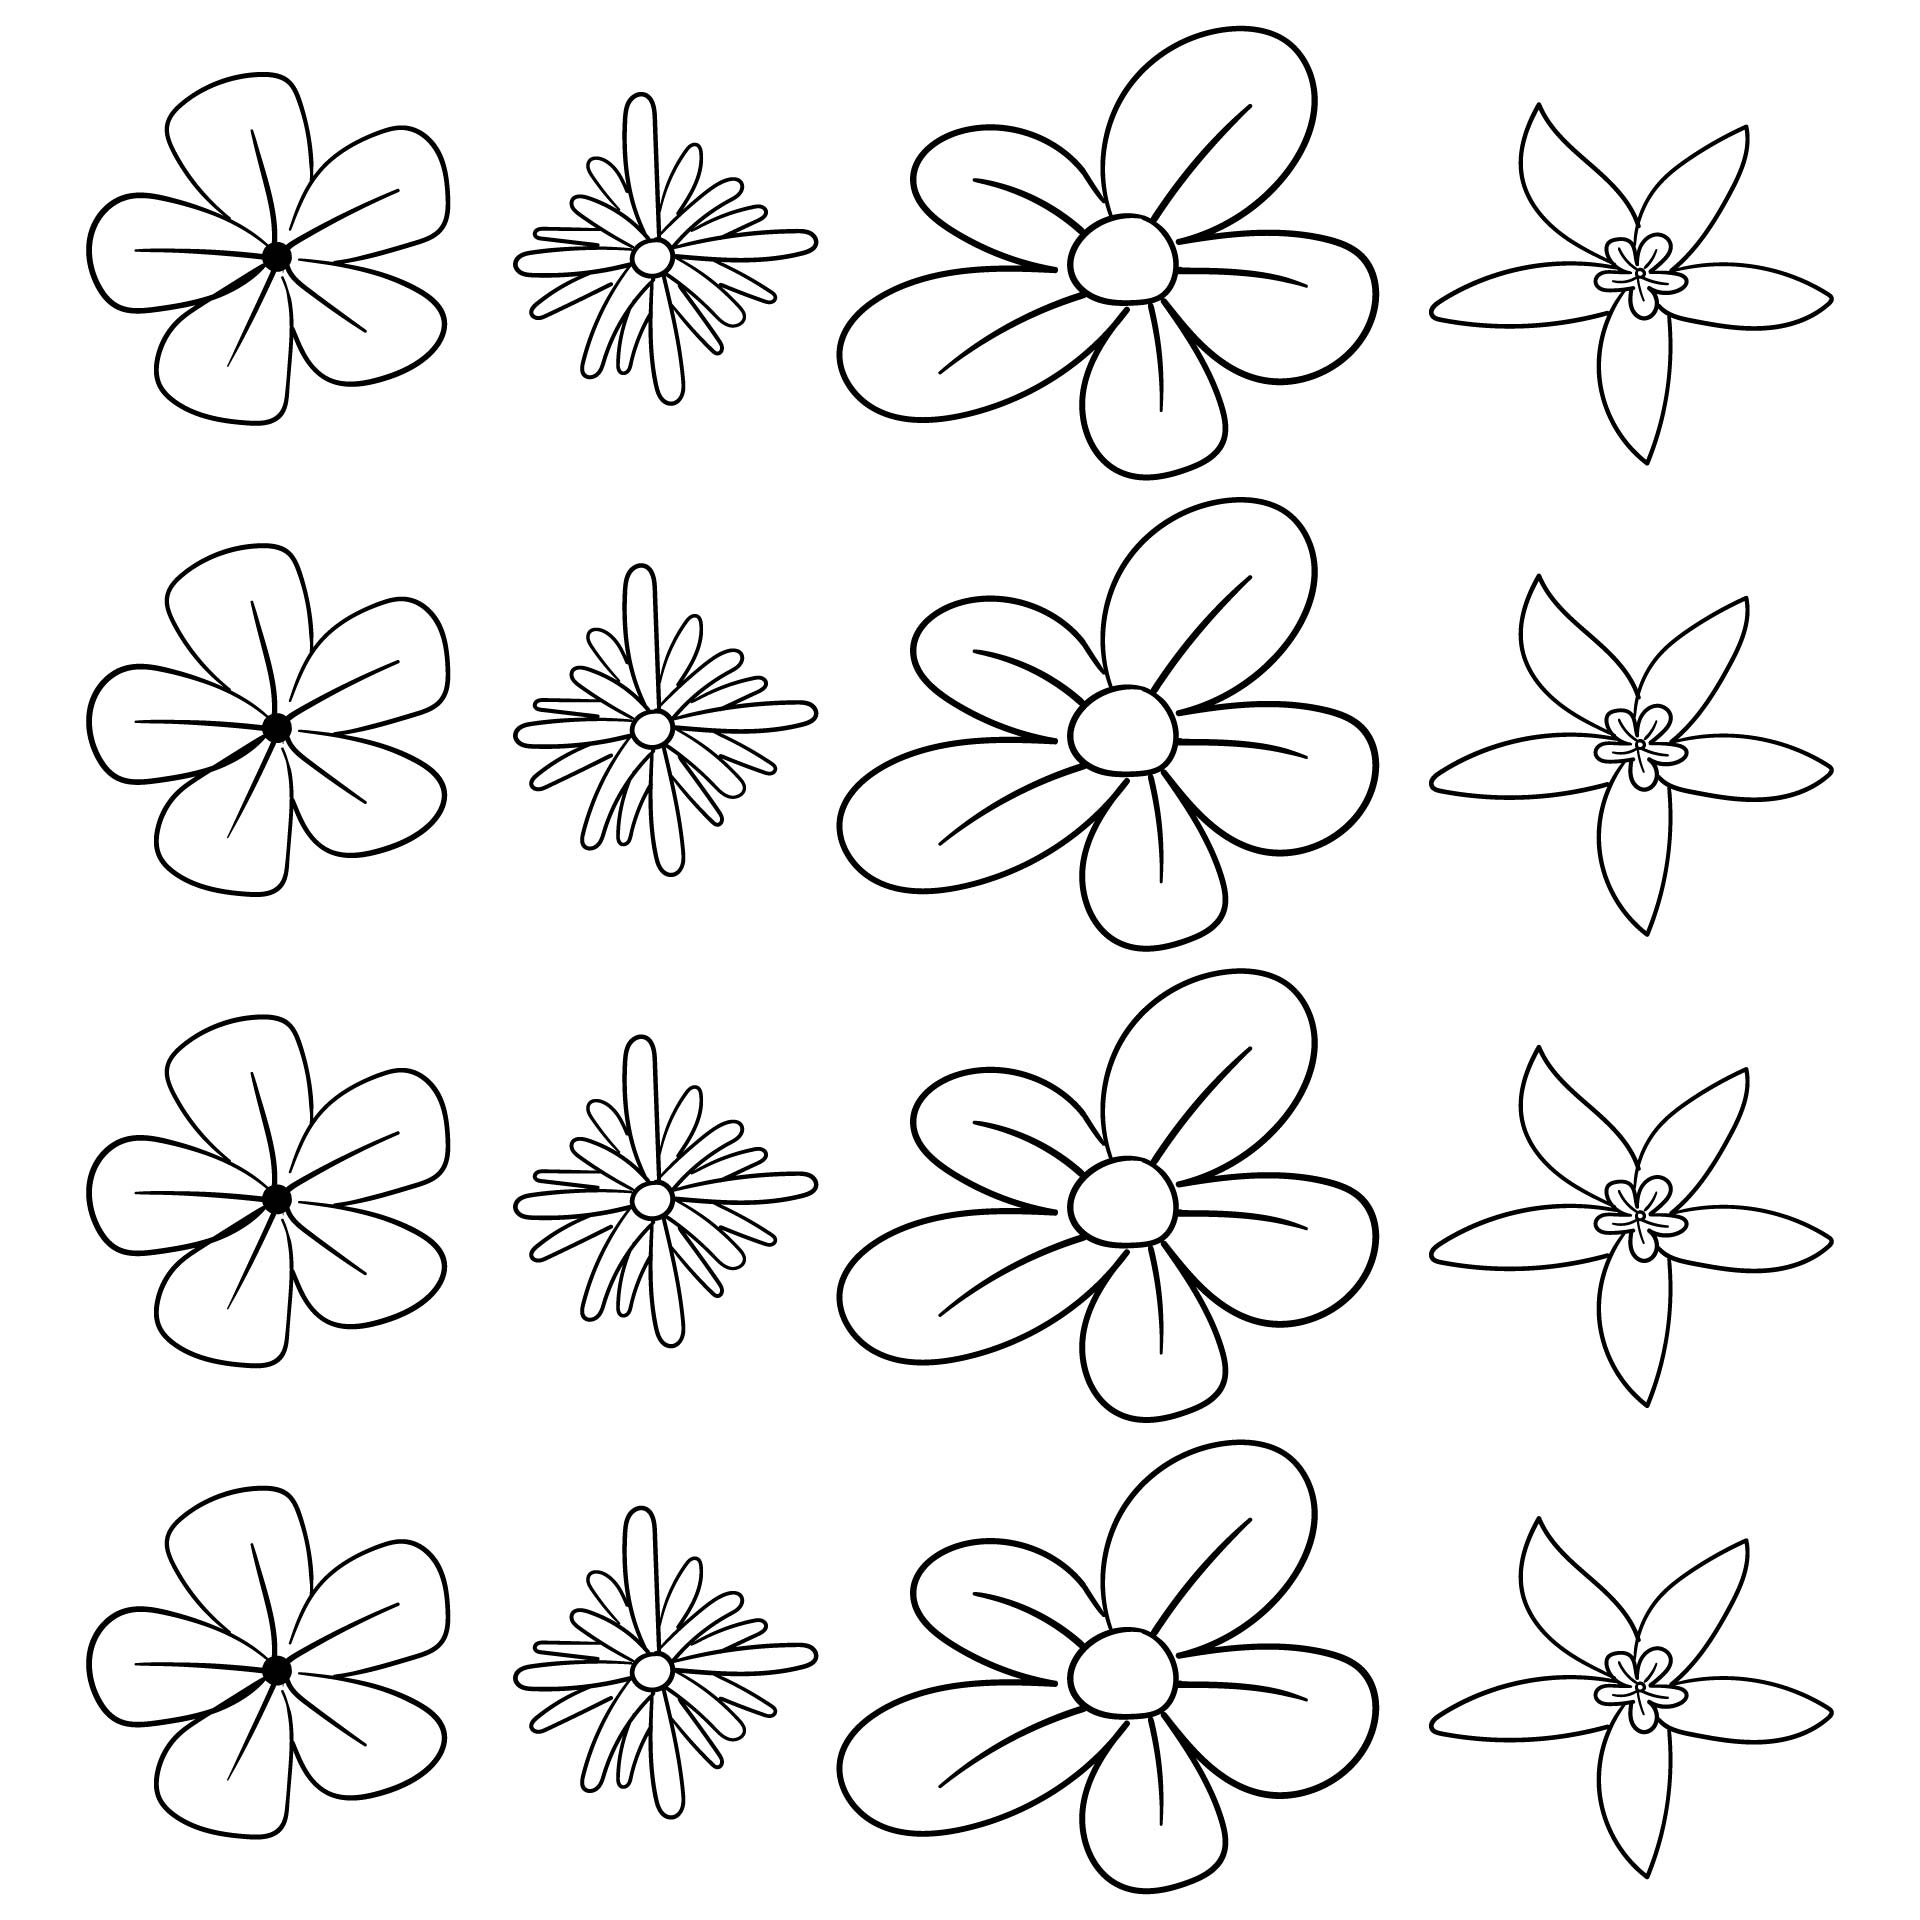 Flower Shape Cut Out Template